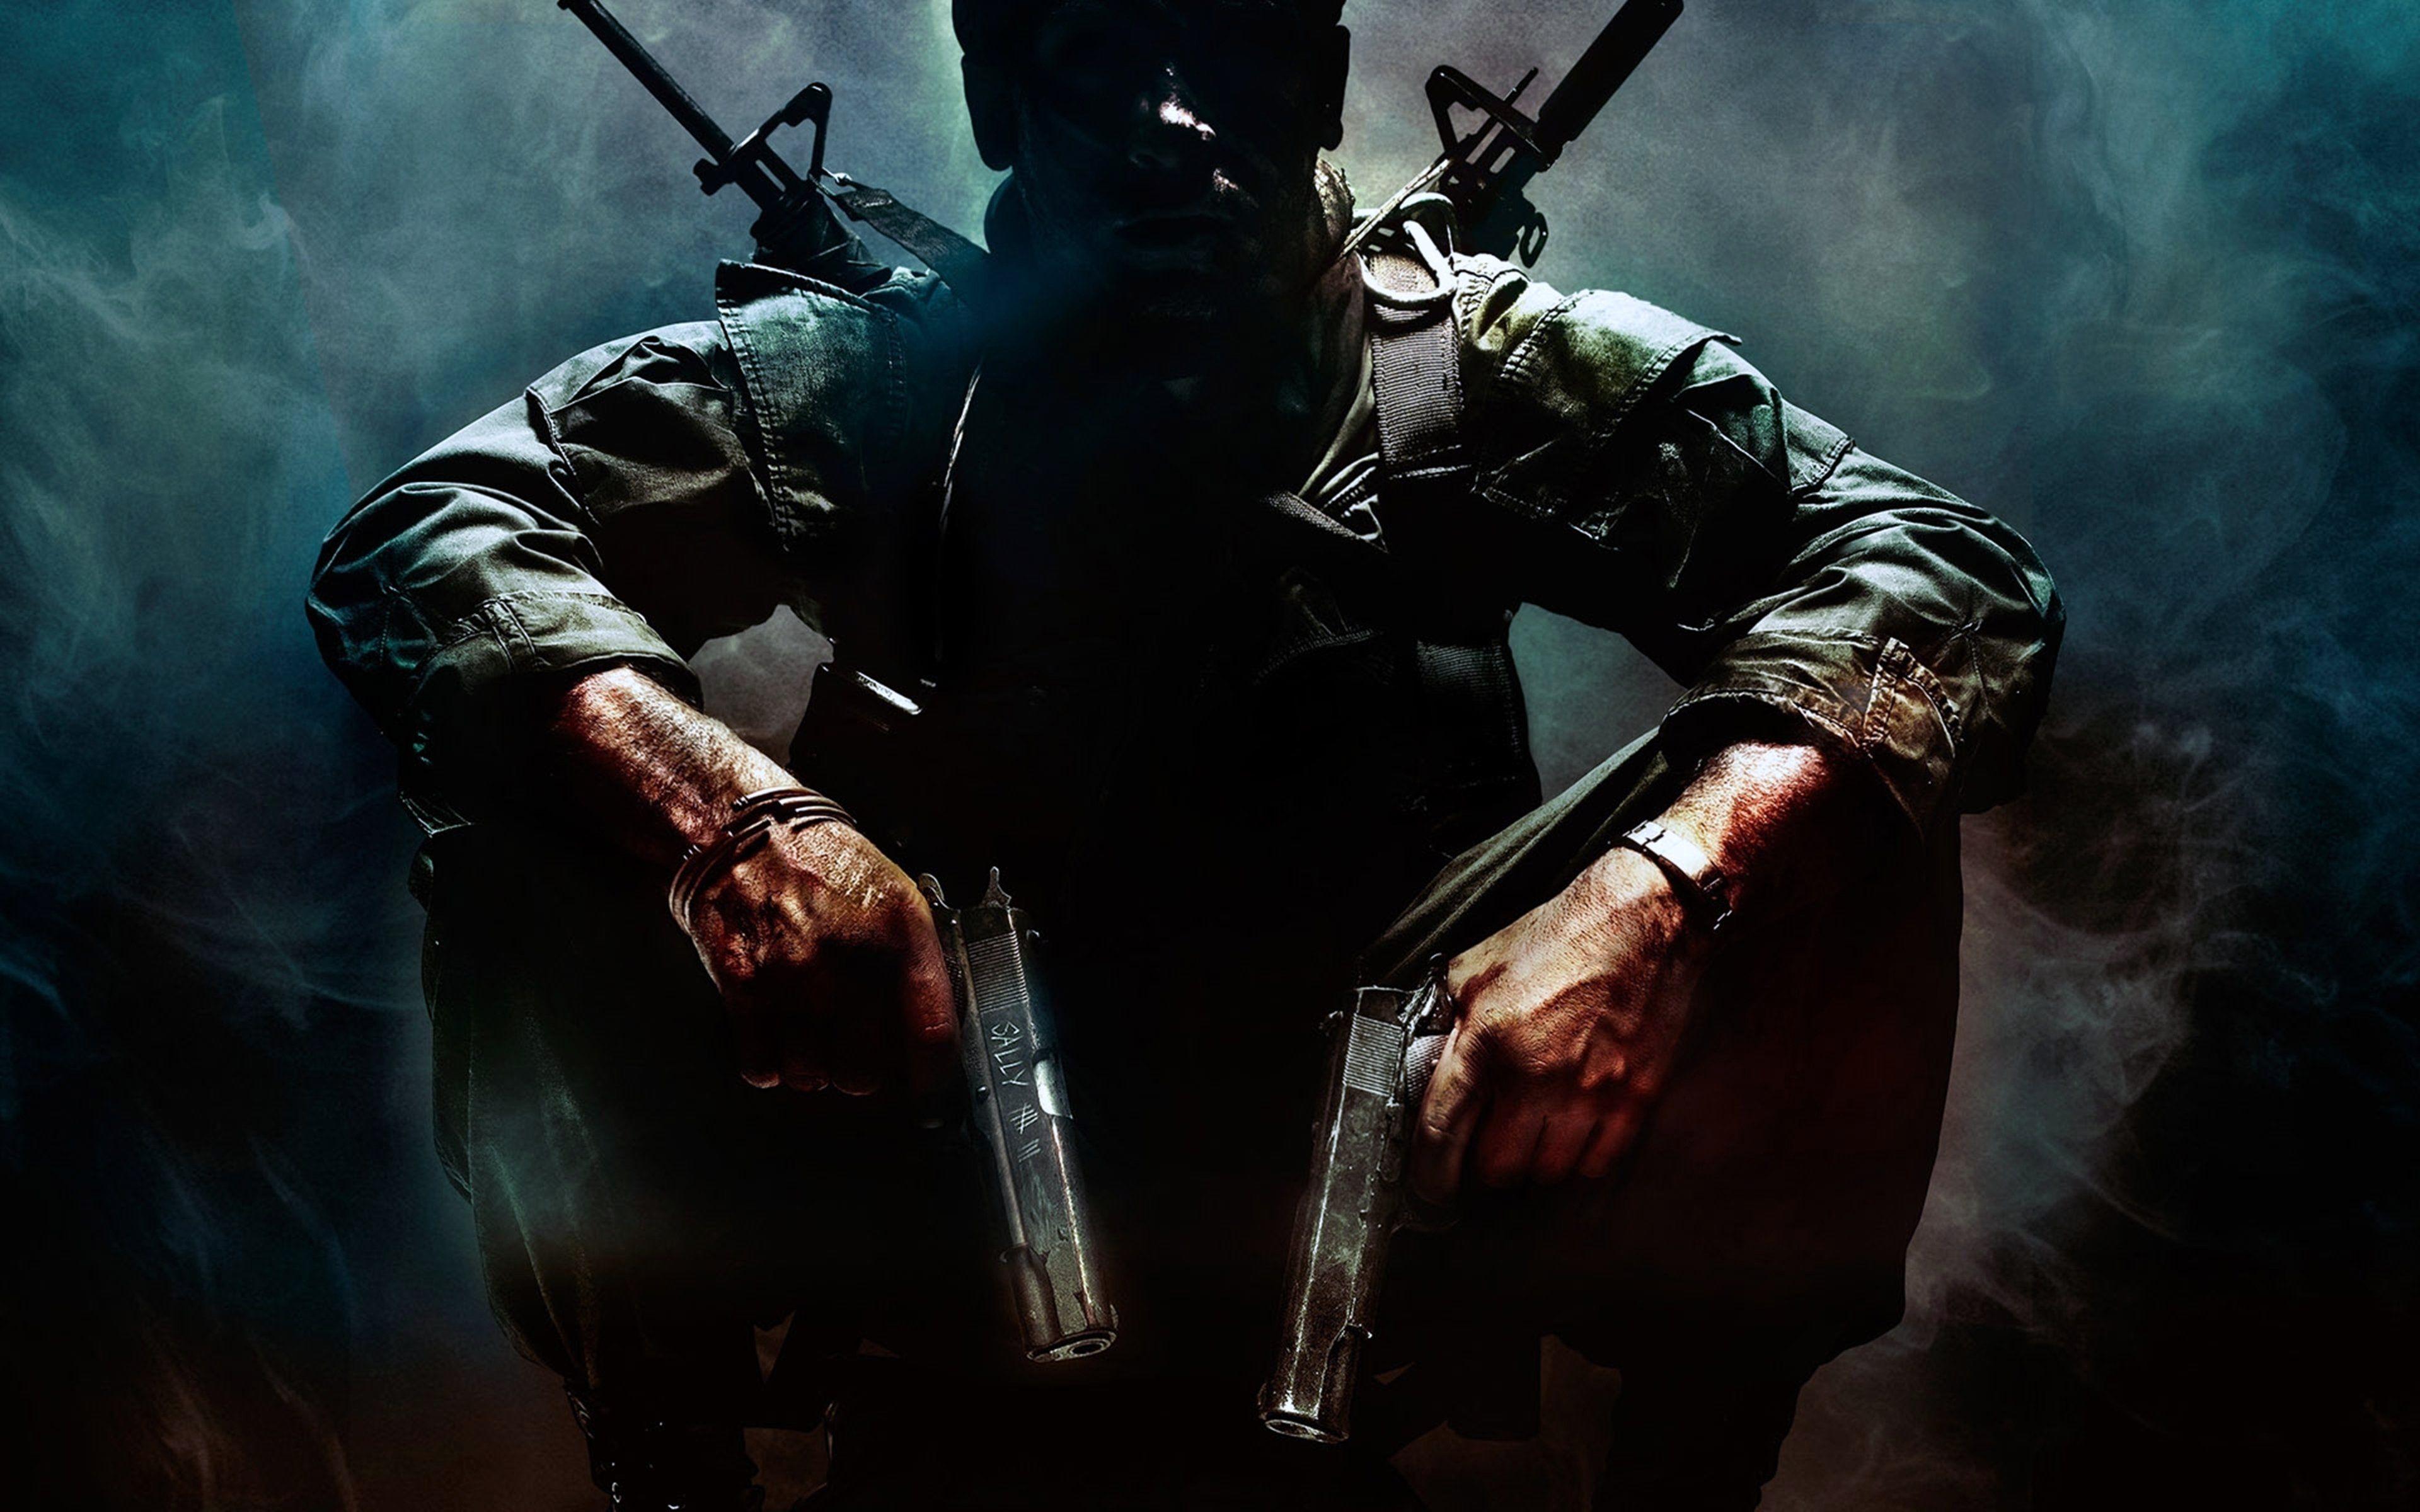 Military Soldier Fighter Pistols Struggle Valor Gangs War Guns